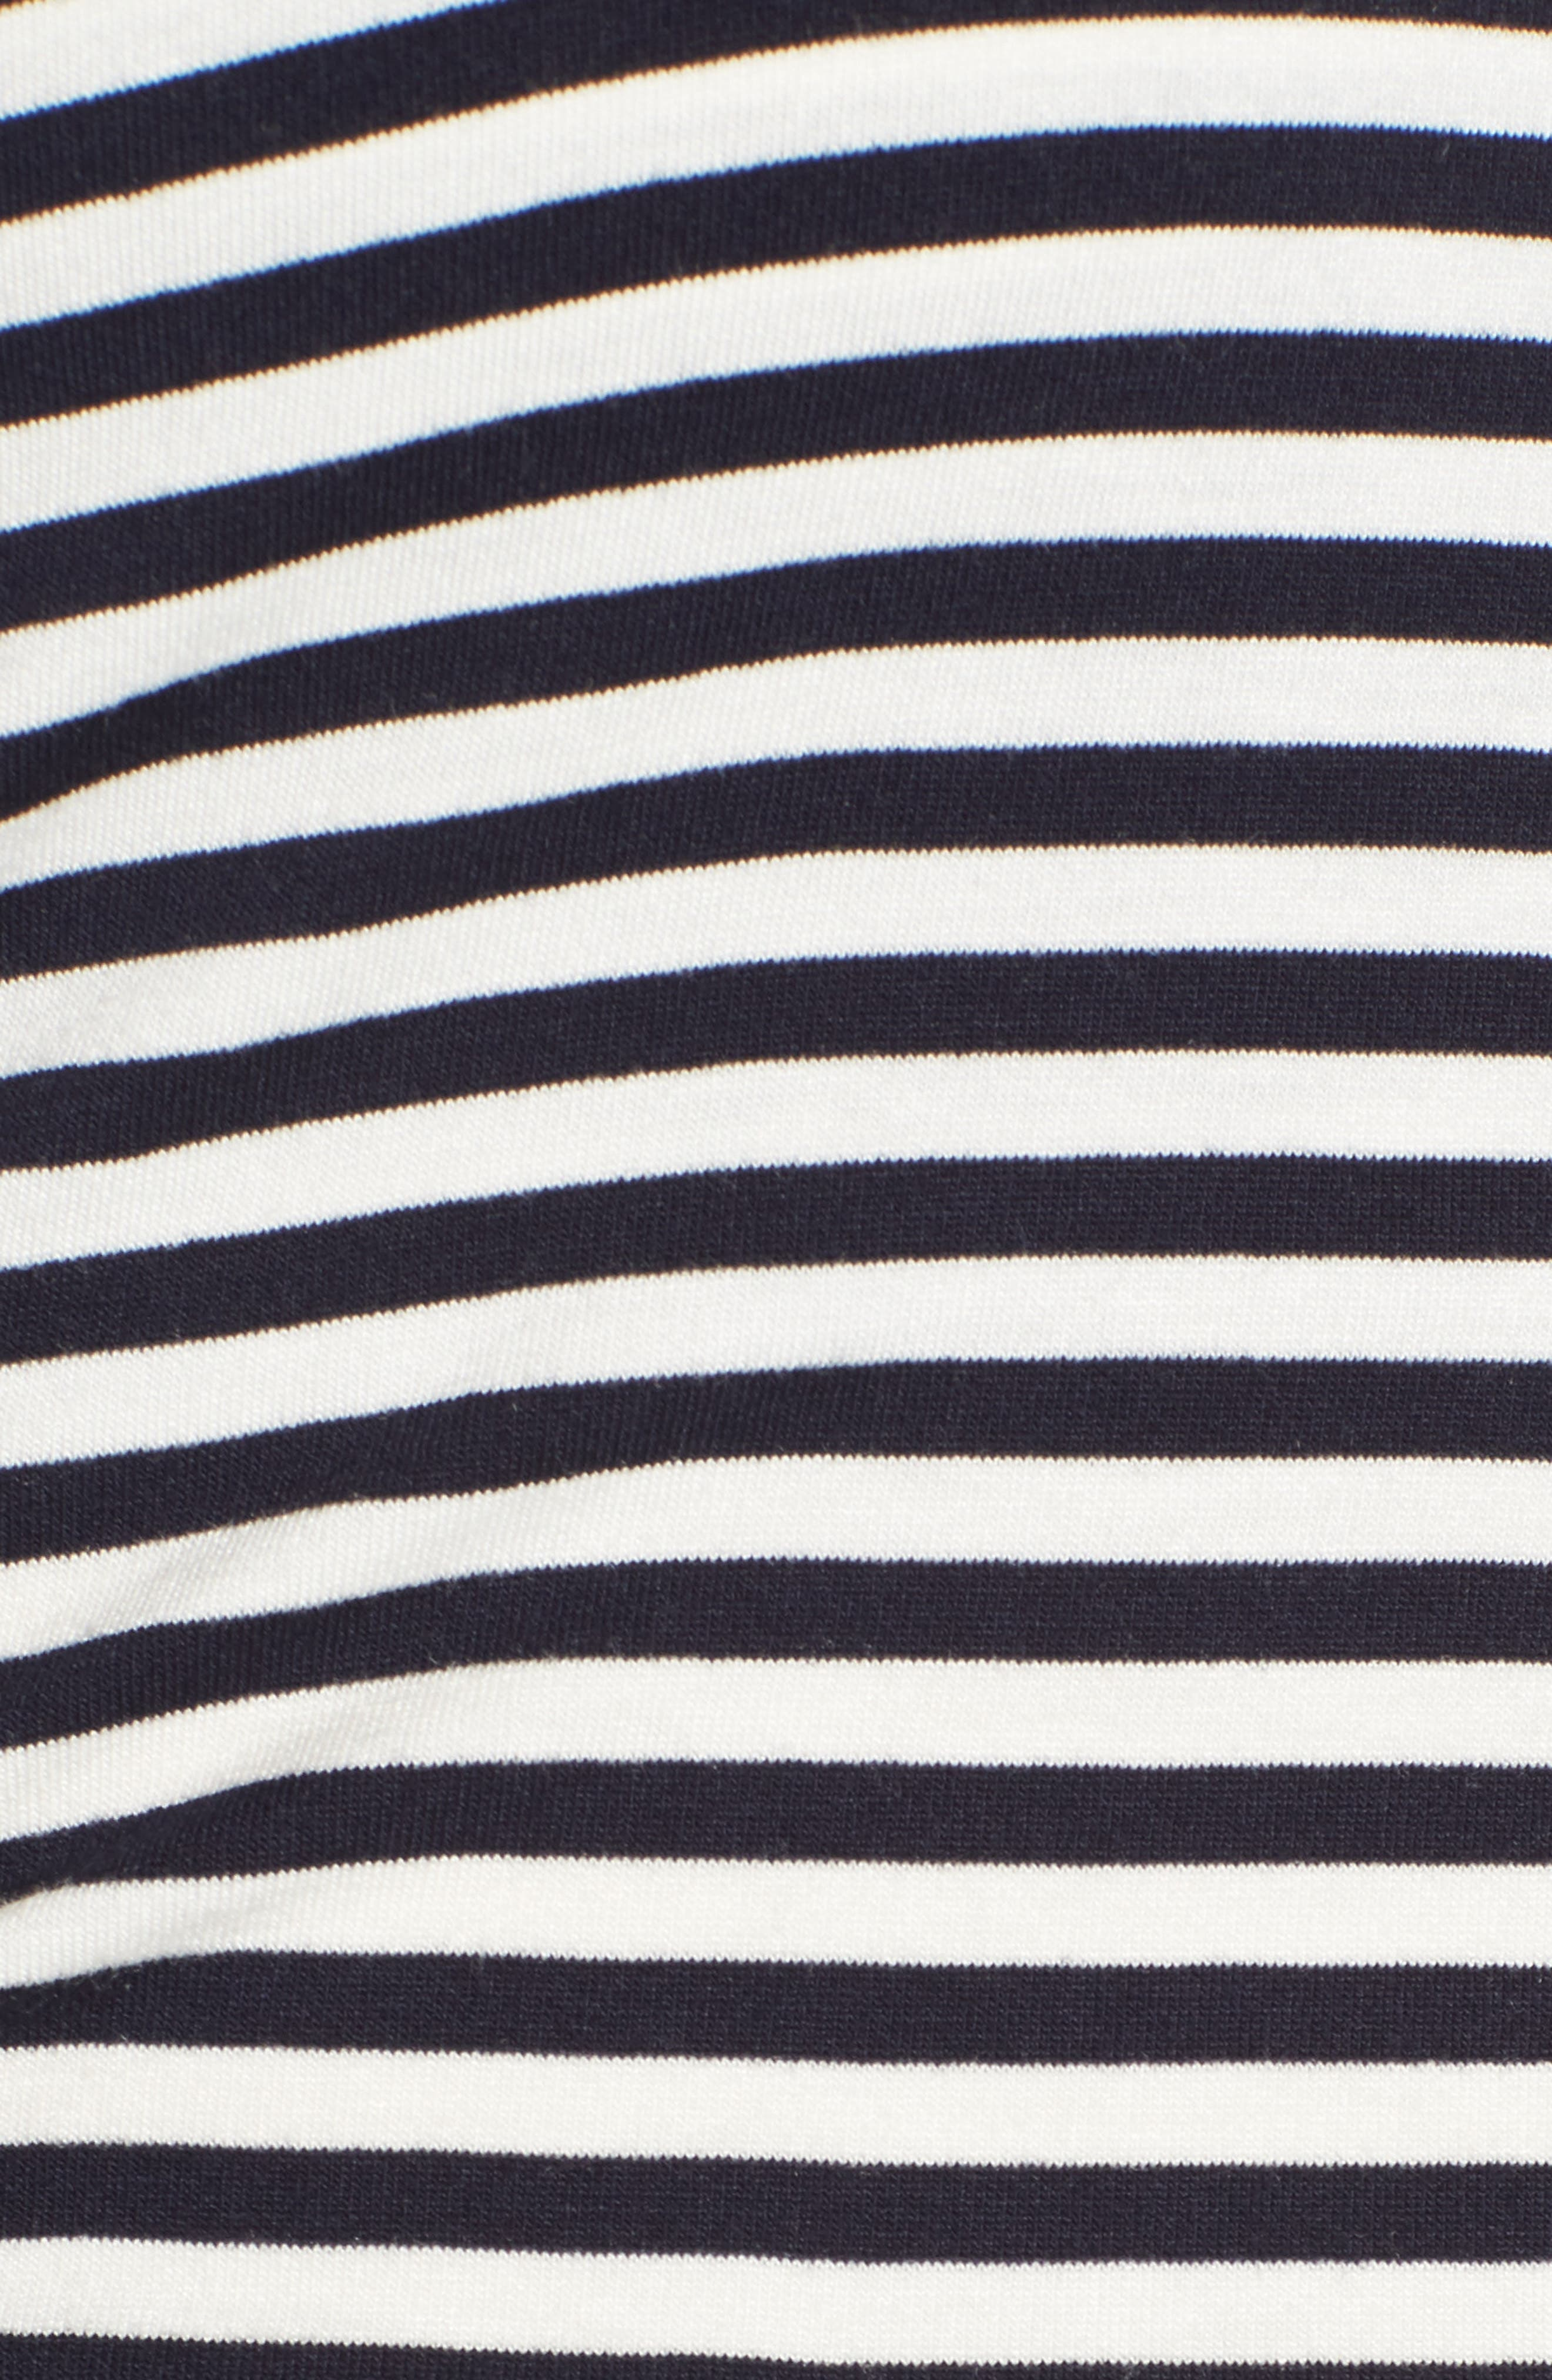 Arlington Stripe Maternity Tee,                             Alternate thumbnail 5, color,                             Navy/ Off White